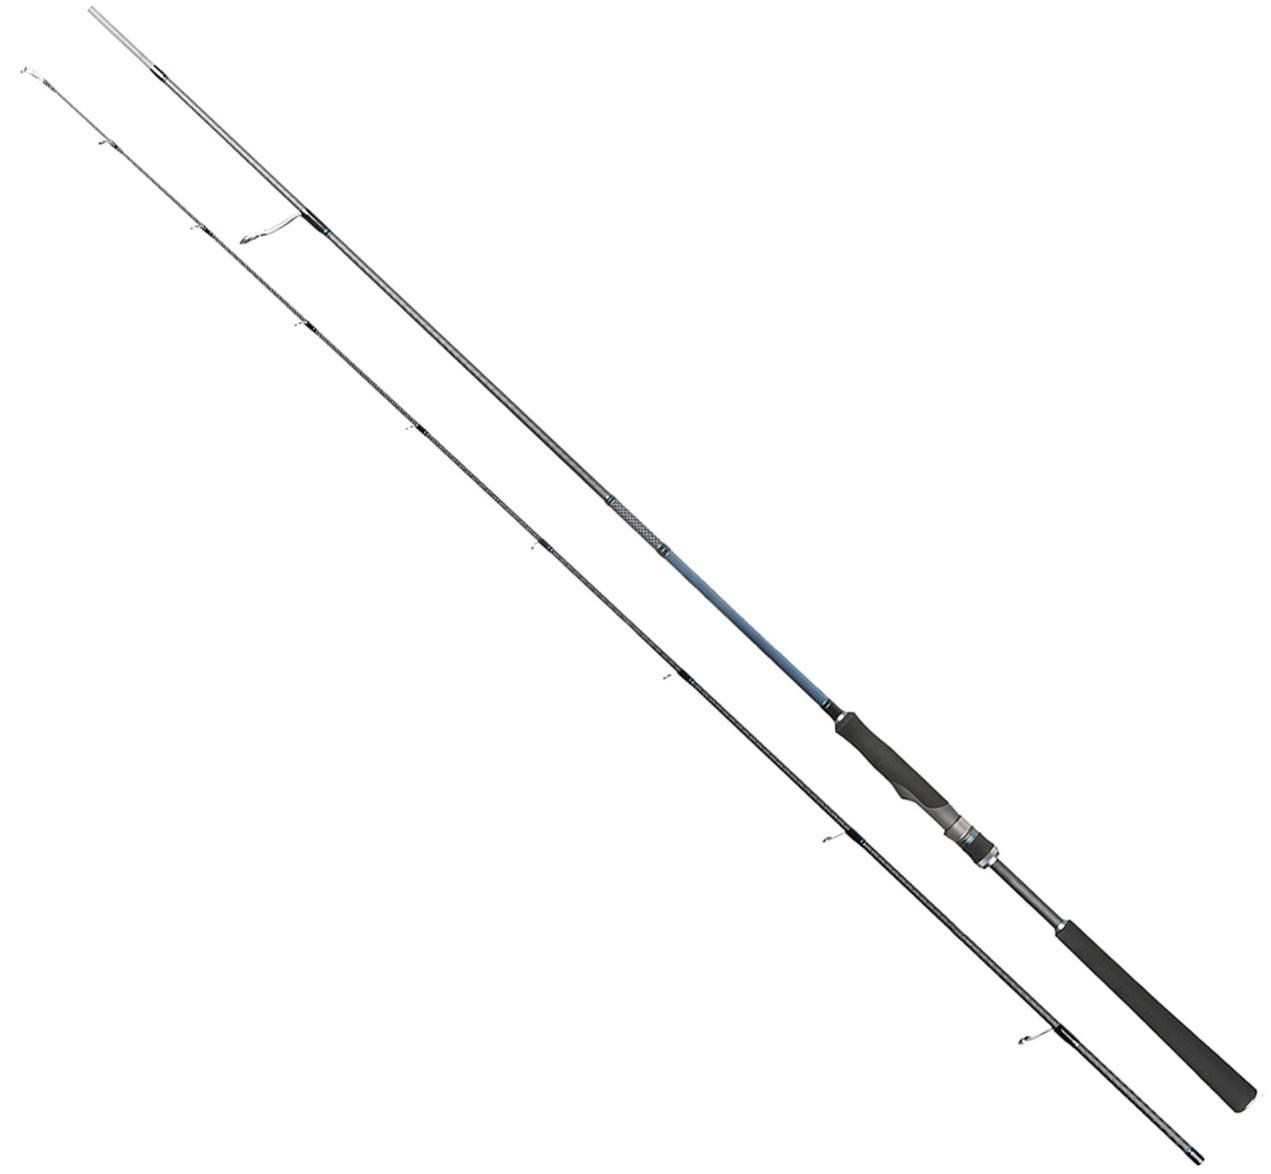 Спиннинг Favorite Shooter SHT-962MH 2.90 m 15-35 g (1693.02.36)